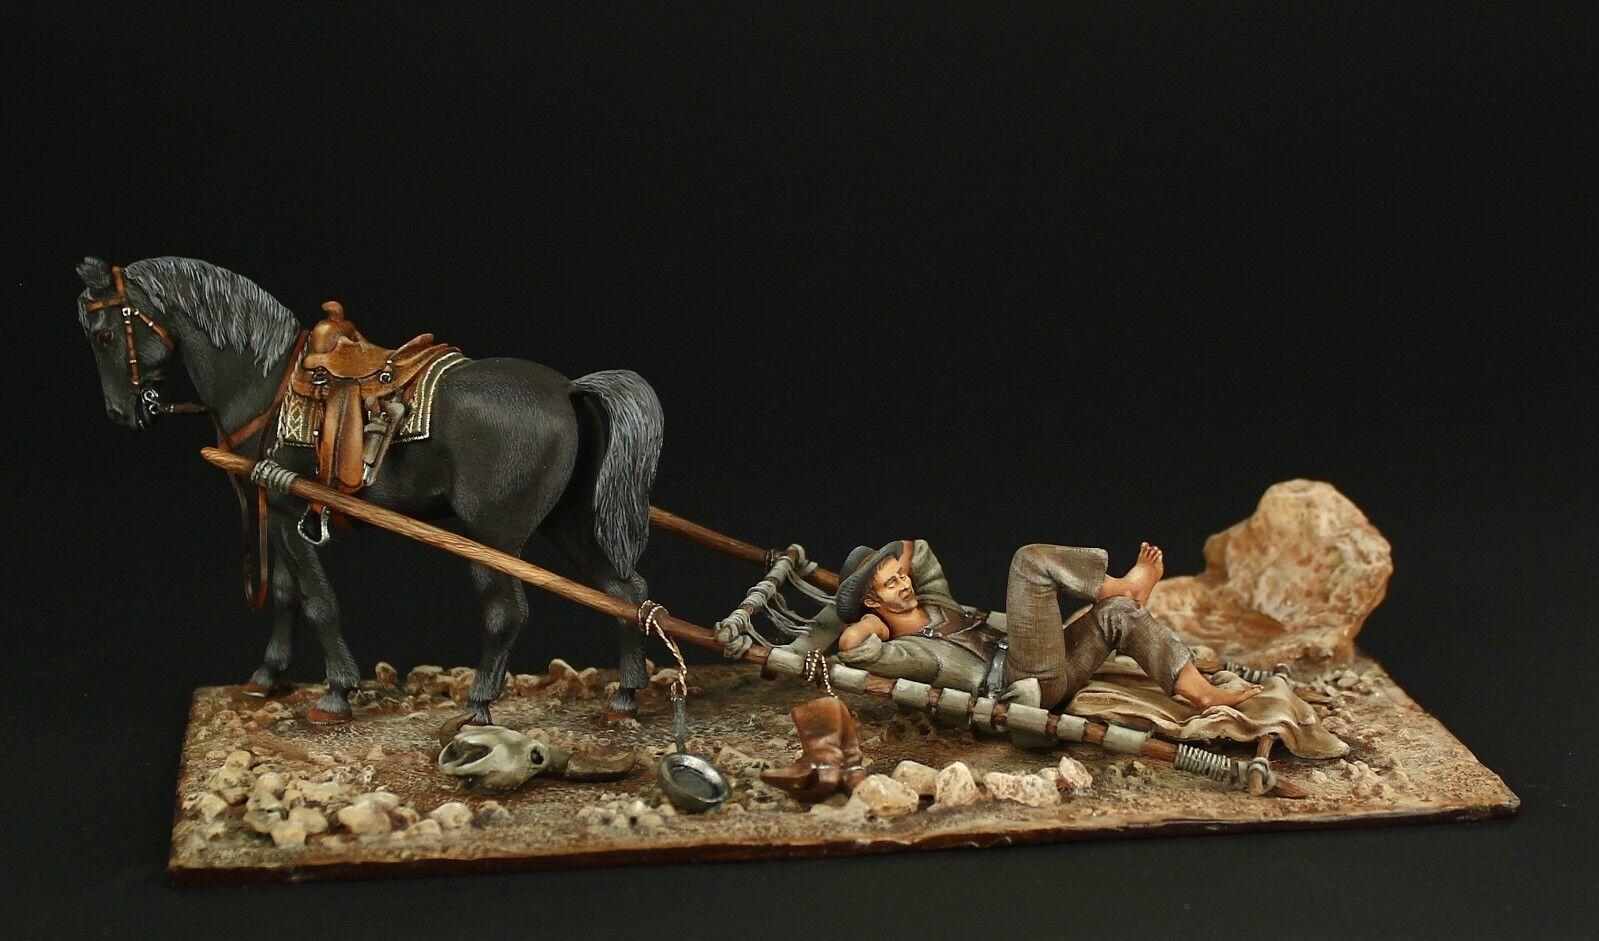 ELITE TIN SOLDIER  Western Colt 54 mm,metal sculpture.